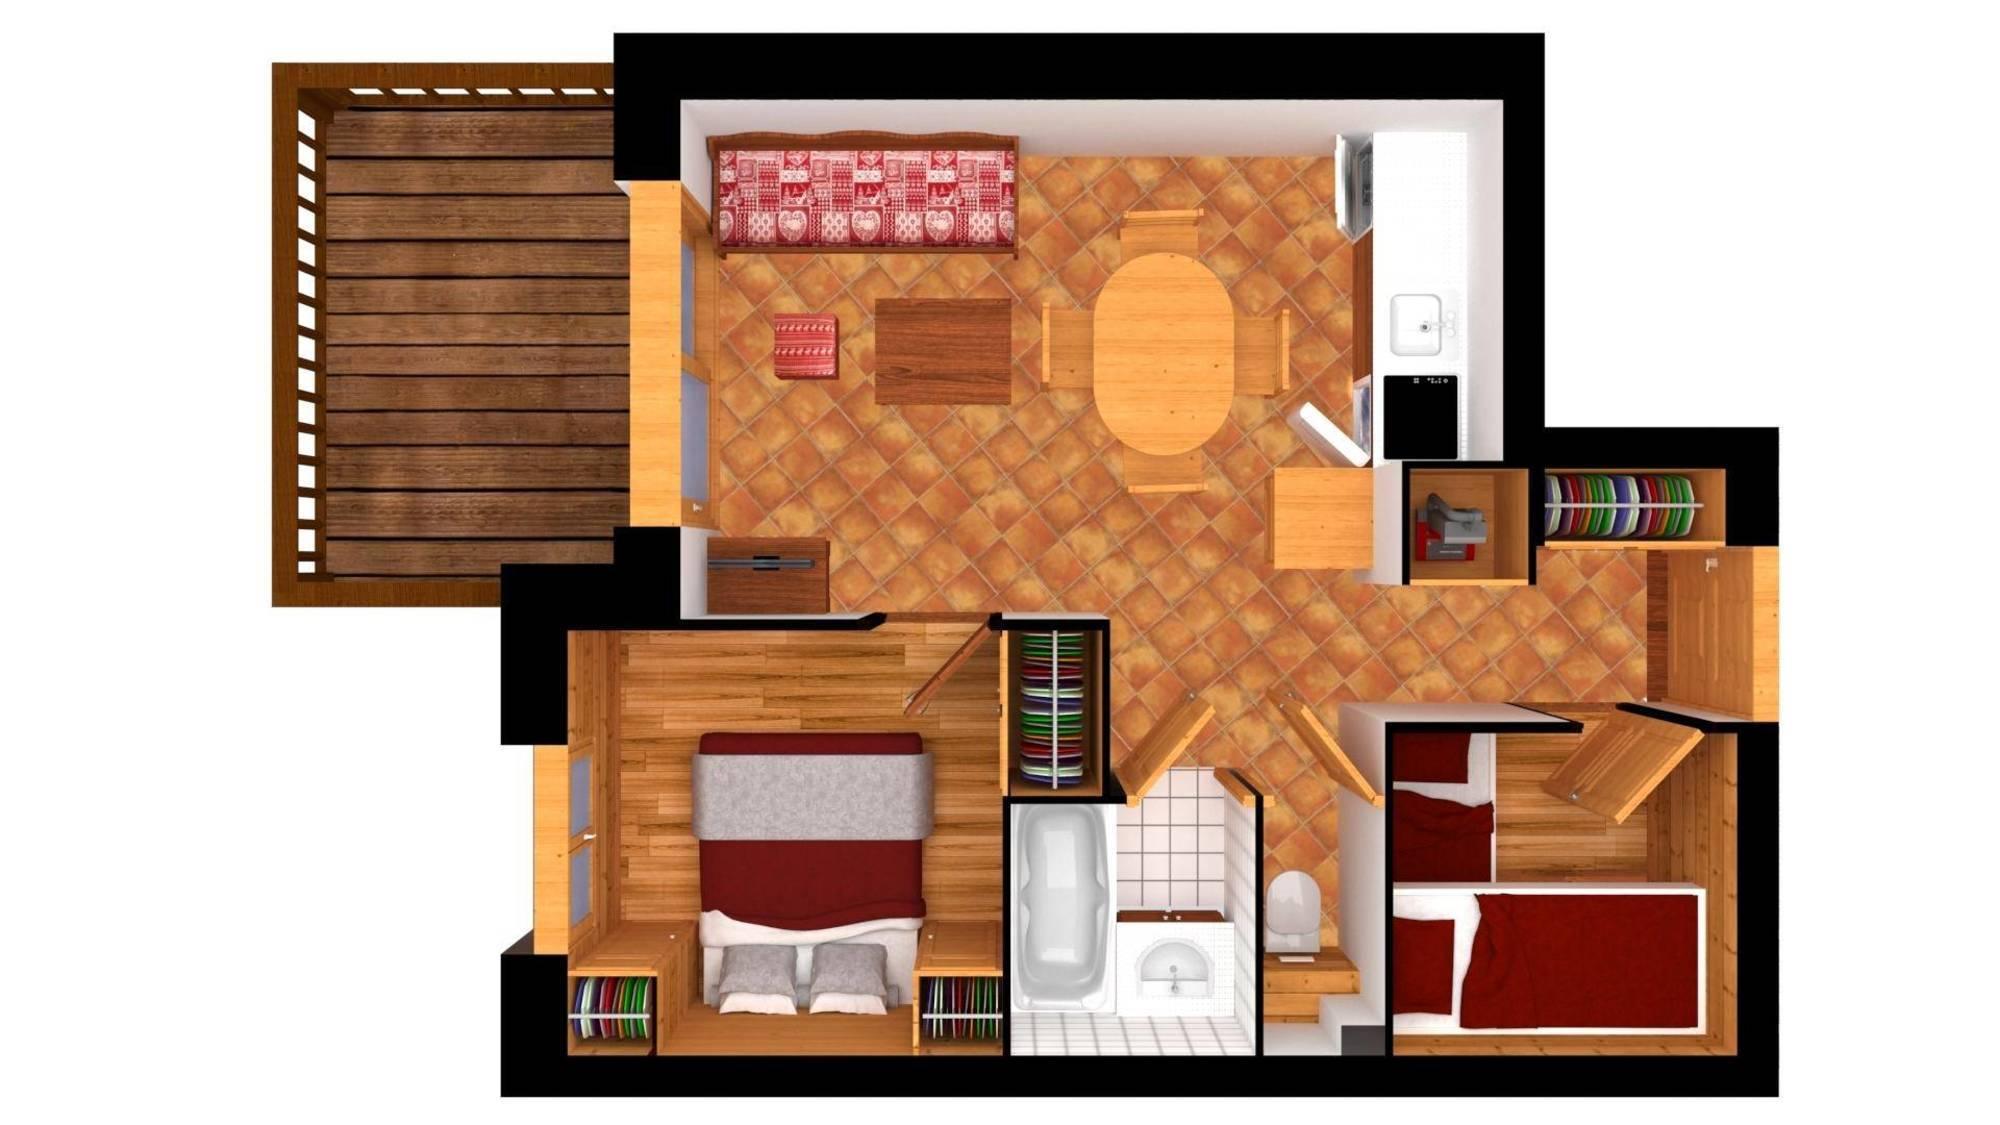 Apartment Ferme Fretes 11 Meribel Floor Plan 1